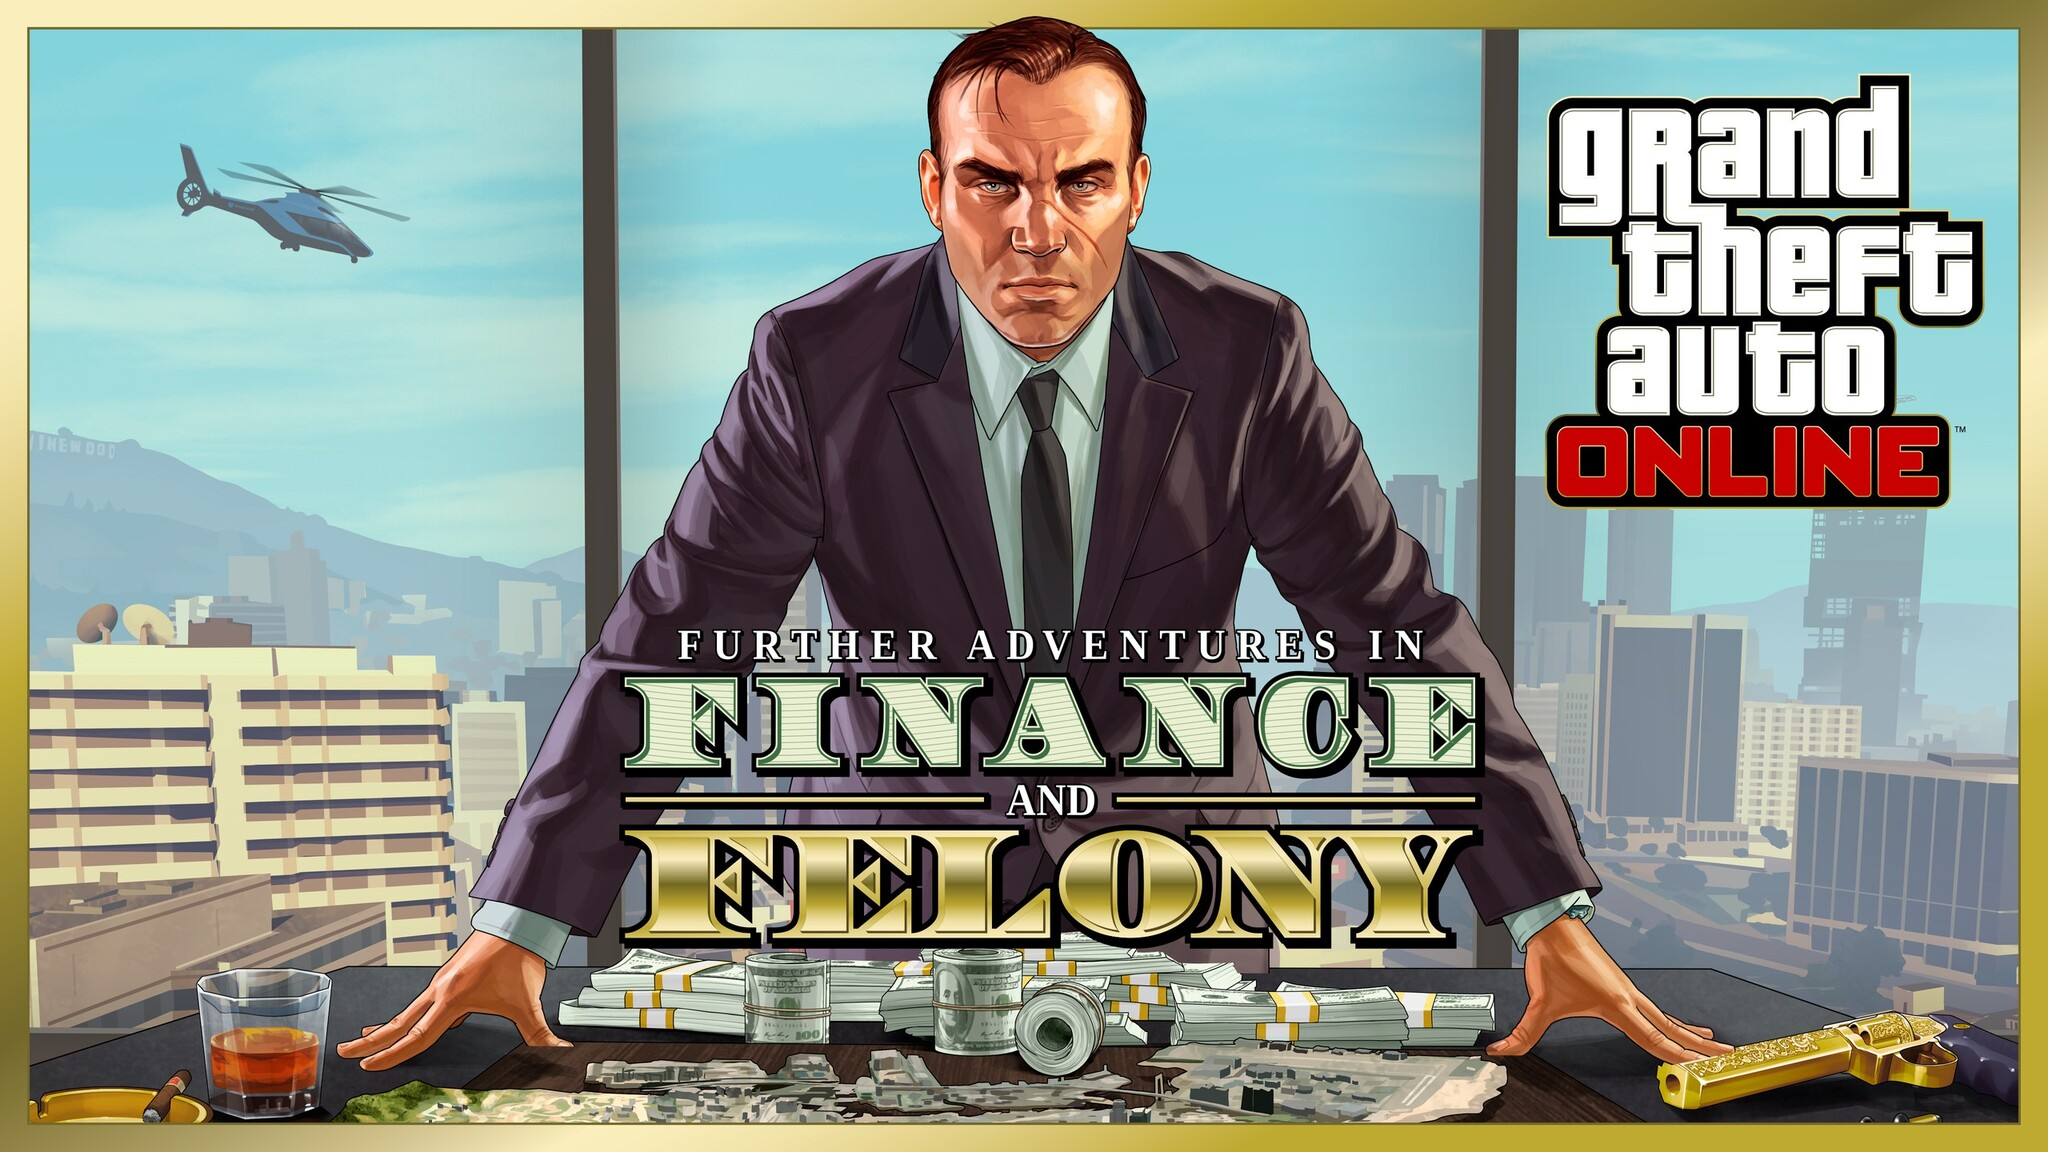 2048x1152 Gta V Redux Nature 2048x1152 Resolution Hd 4k: 2048x1152 Grand Theft Auto V Online 2048x1152 Resolution